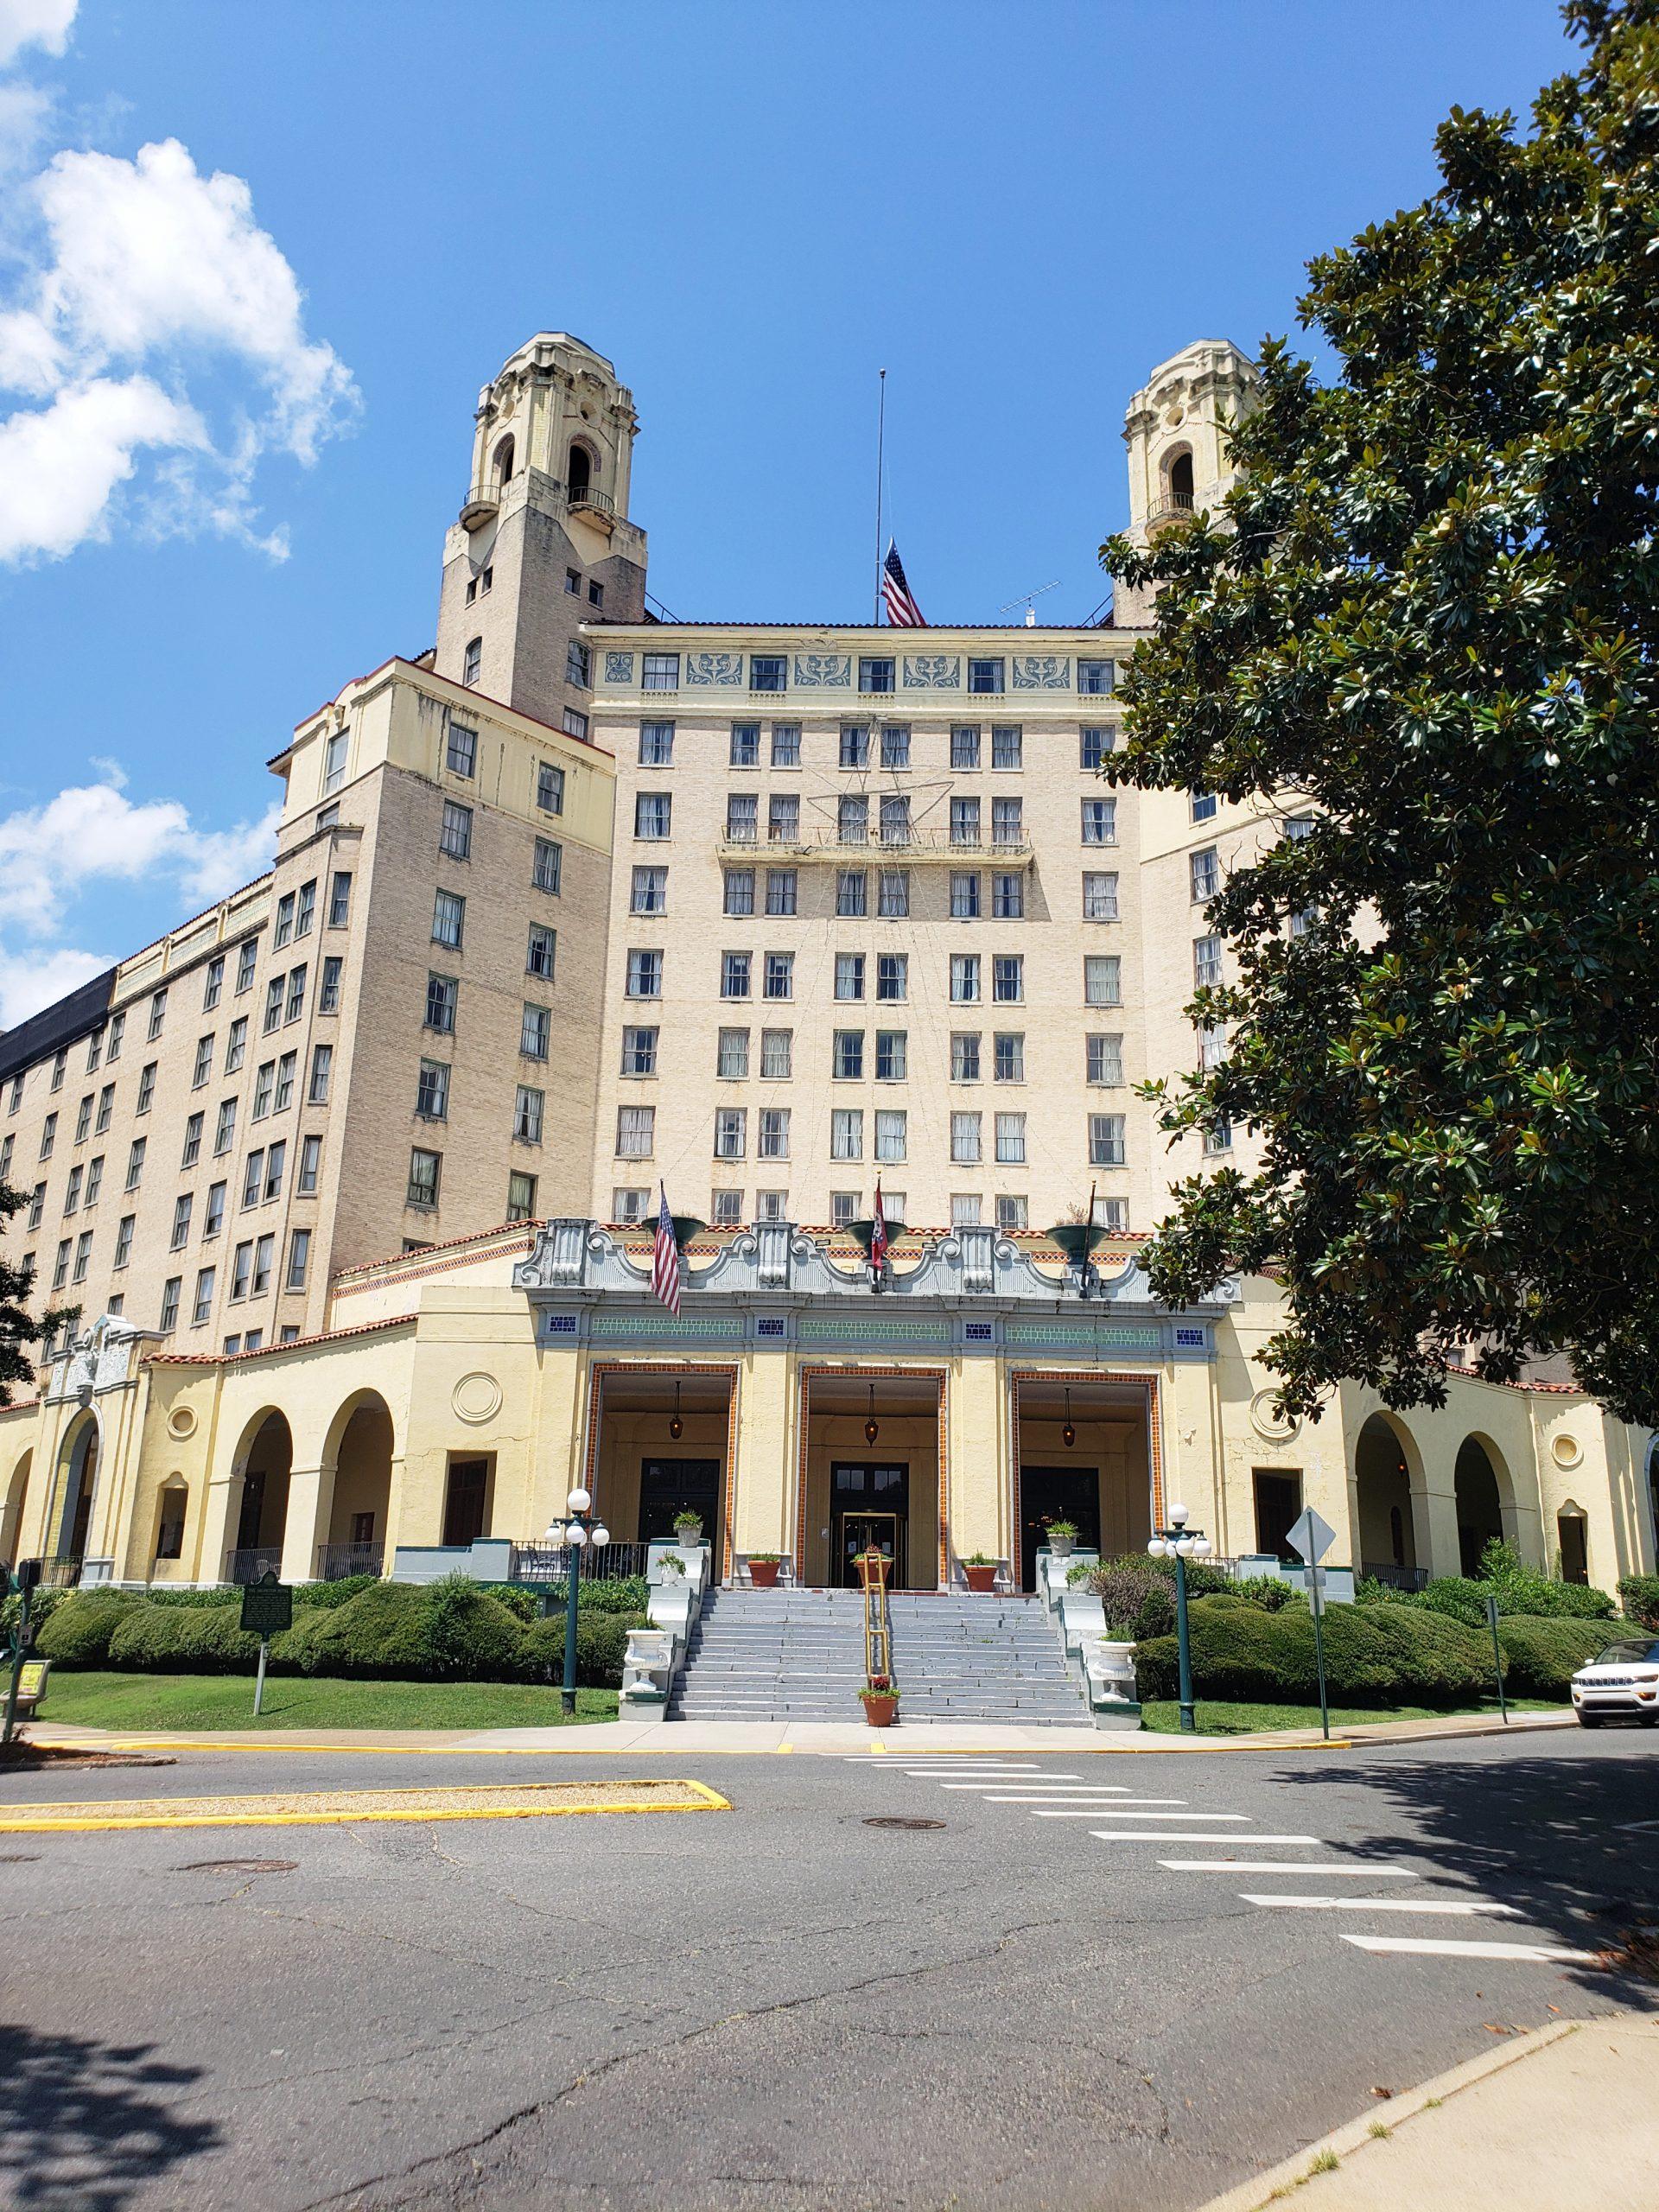 Arlington Hotel, Hotel Springs, Arkansas (Photo Credit: Violet Sky)